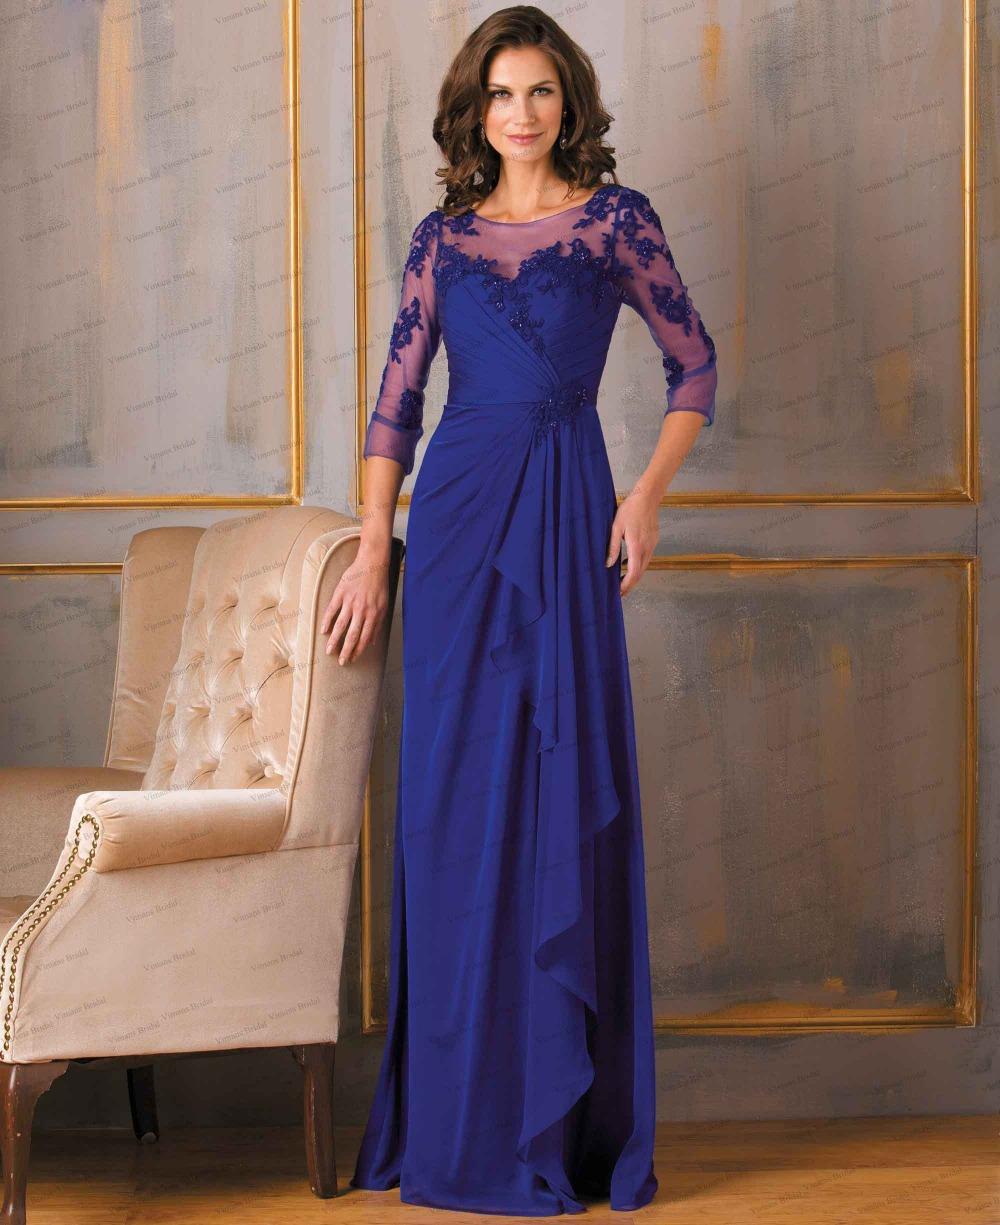 Mother Bride Dresses Sale: 2015 Hot Sale O Neck Appliqued Long Chiffon Backless